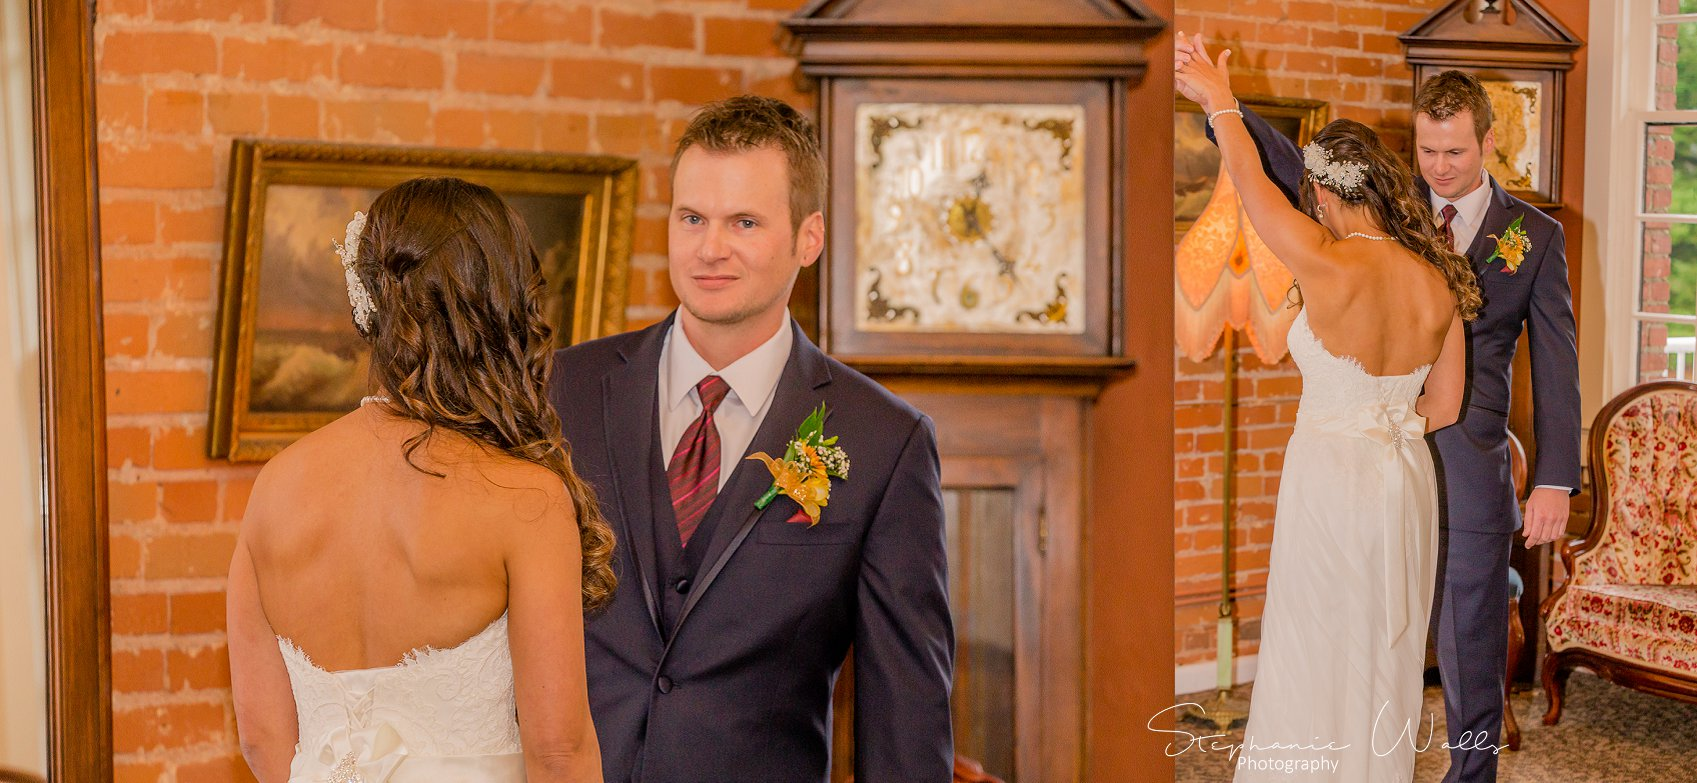 1st look Bridals 026 KK & Zack | Hollywood Schoolhouse Wedding | Woodinville, Wa Wedding Photographer